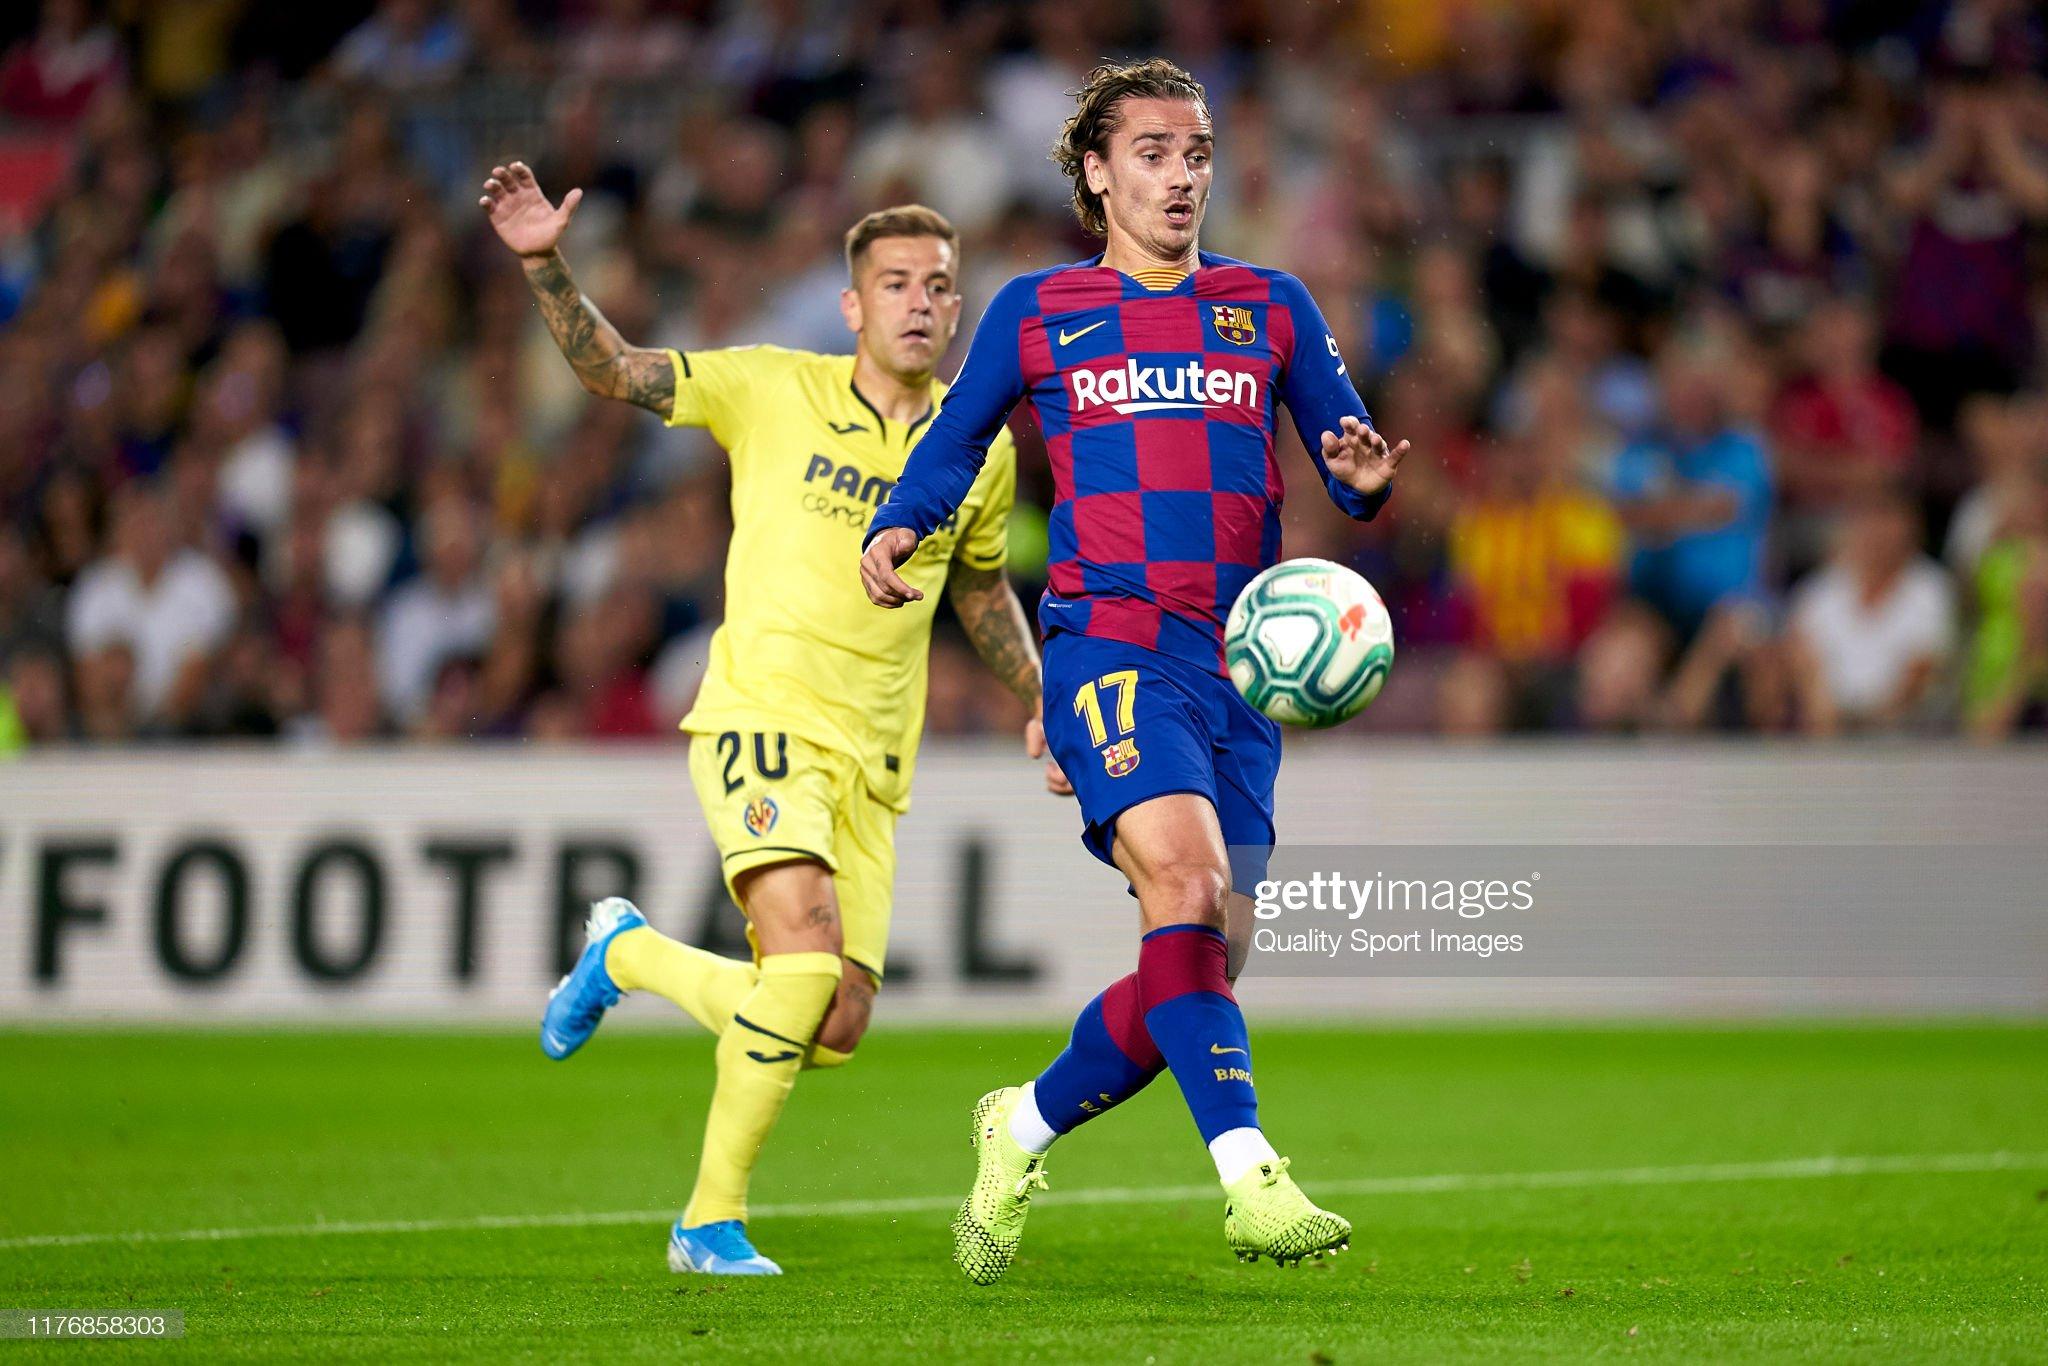 صور مباراة : برشلونة - فياريال 2-1 ( 24-09-2019 )  Antoine-griezmann-of-fc-barcelona-competes-for-the-ball-with-ruben-picture-id1176858303?s=2048x2048